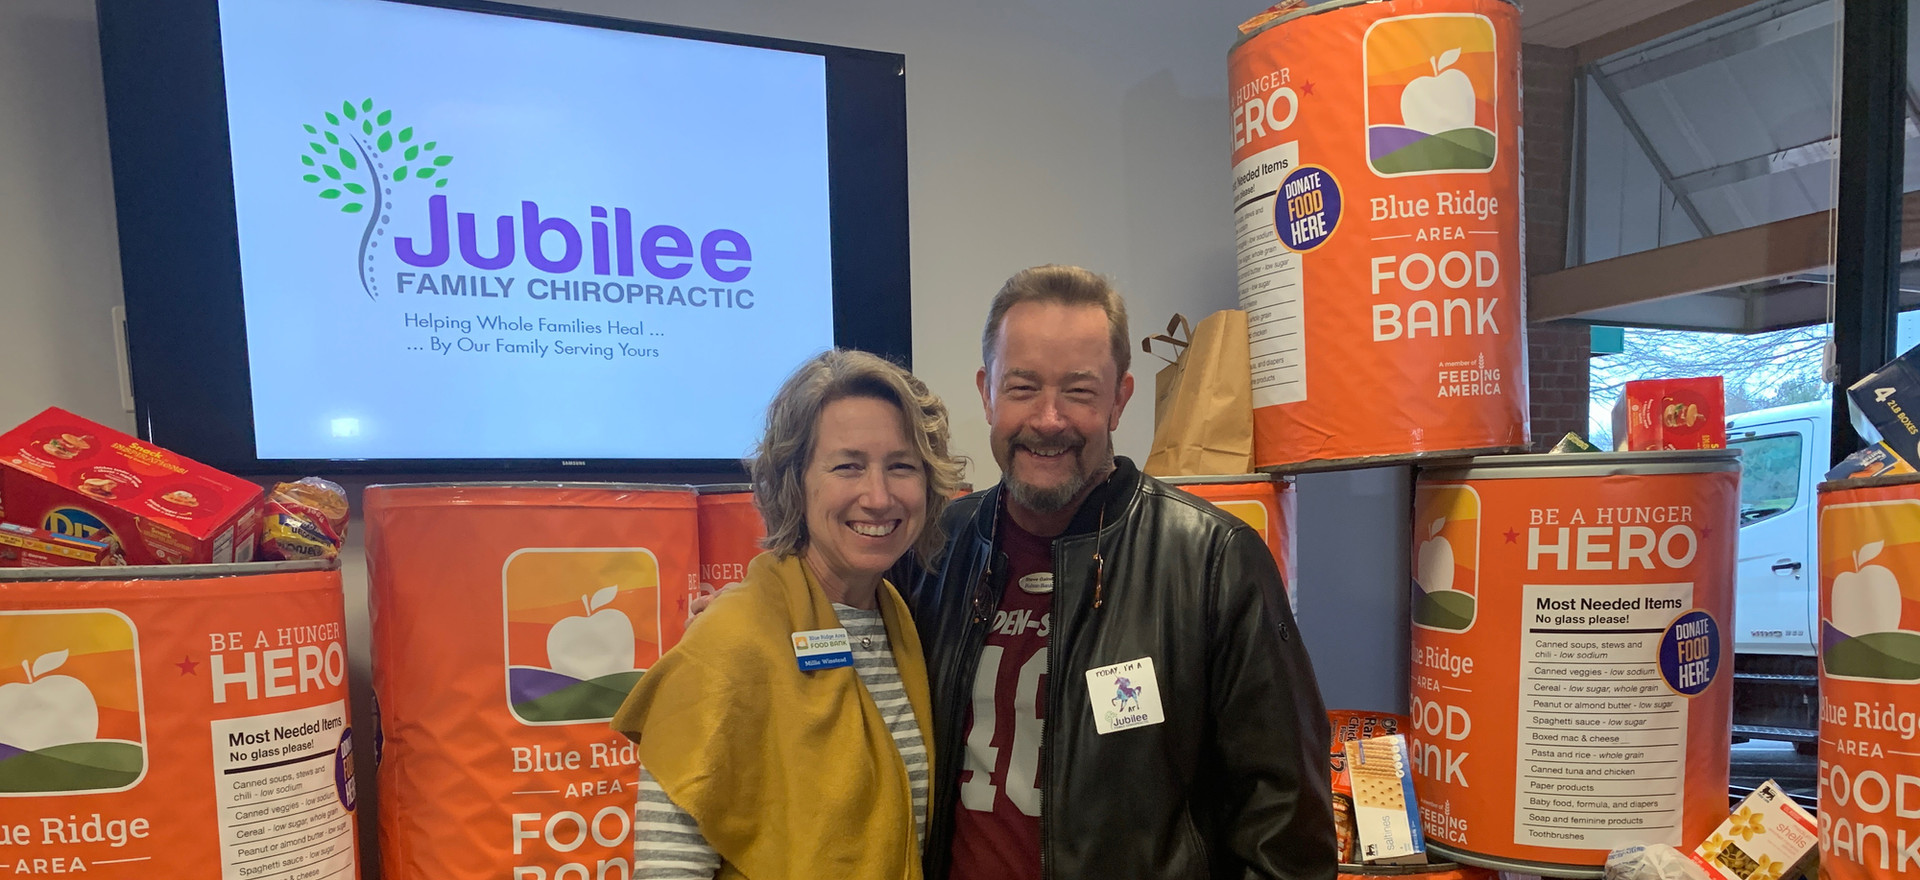 Jubilee Family Chiropractic 2020 Blue Ridge Food Drive. 037